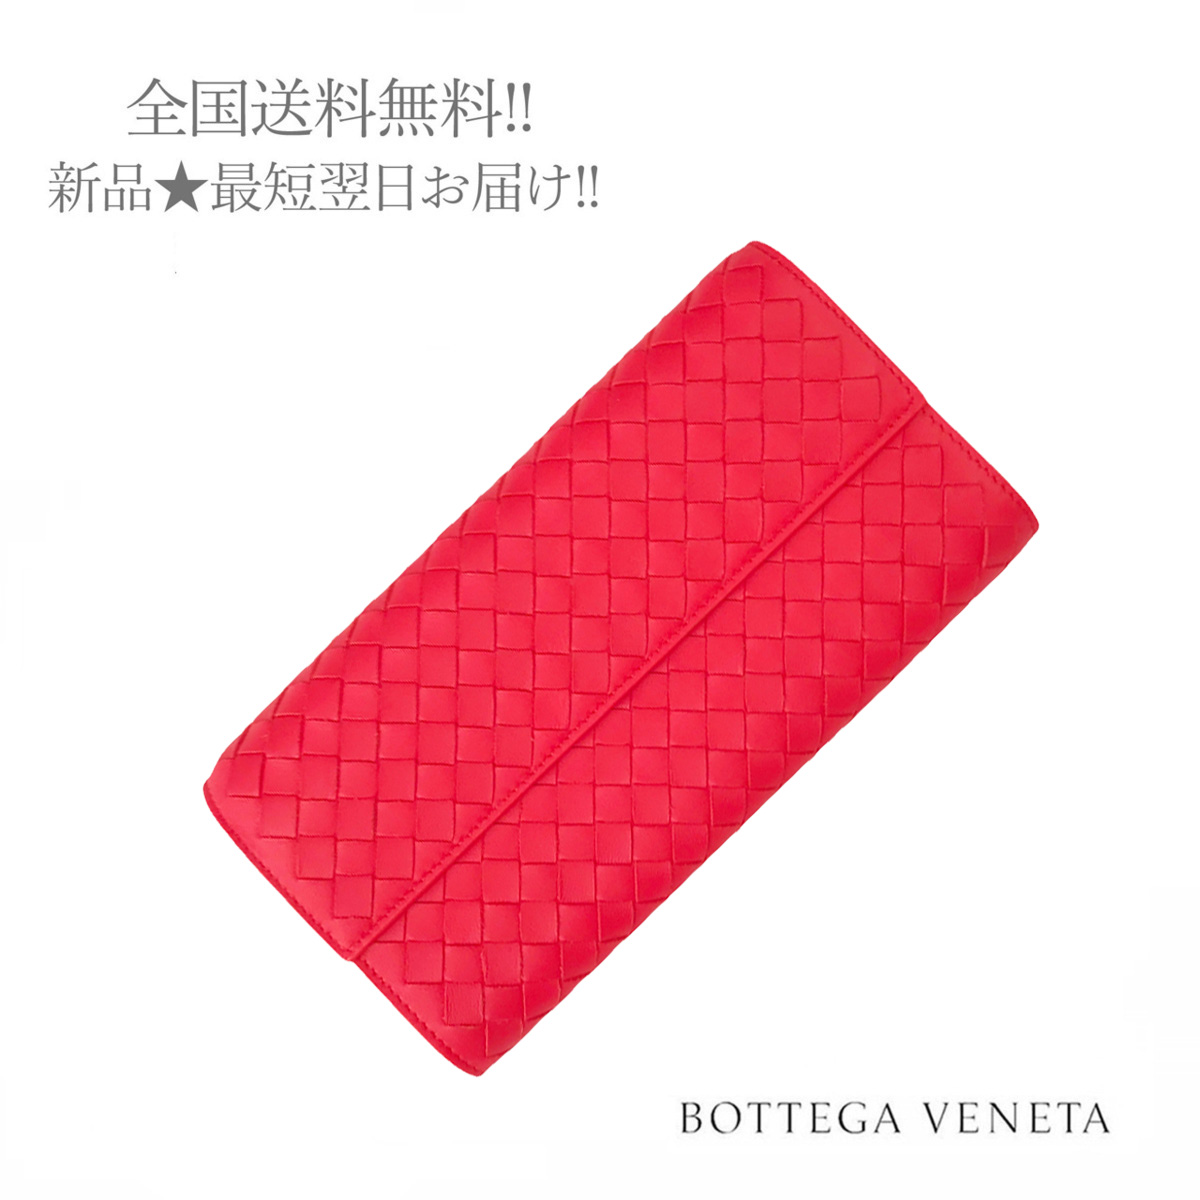 BOTTEGA VENETA ボッテガ ヴェネタ 長財布 ウォレット 二つ折り イントレチャート お見舞い 『1年保証』 女 RED イタリア製 BRIGHT 新品 レディース ナッパ 8913